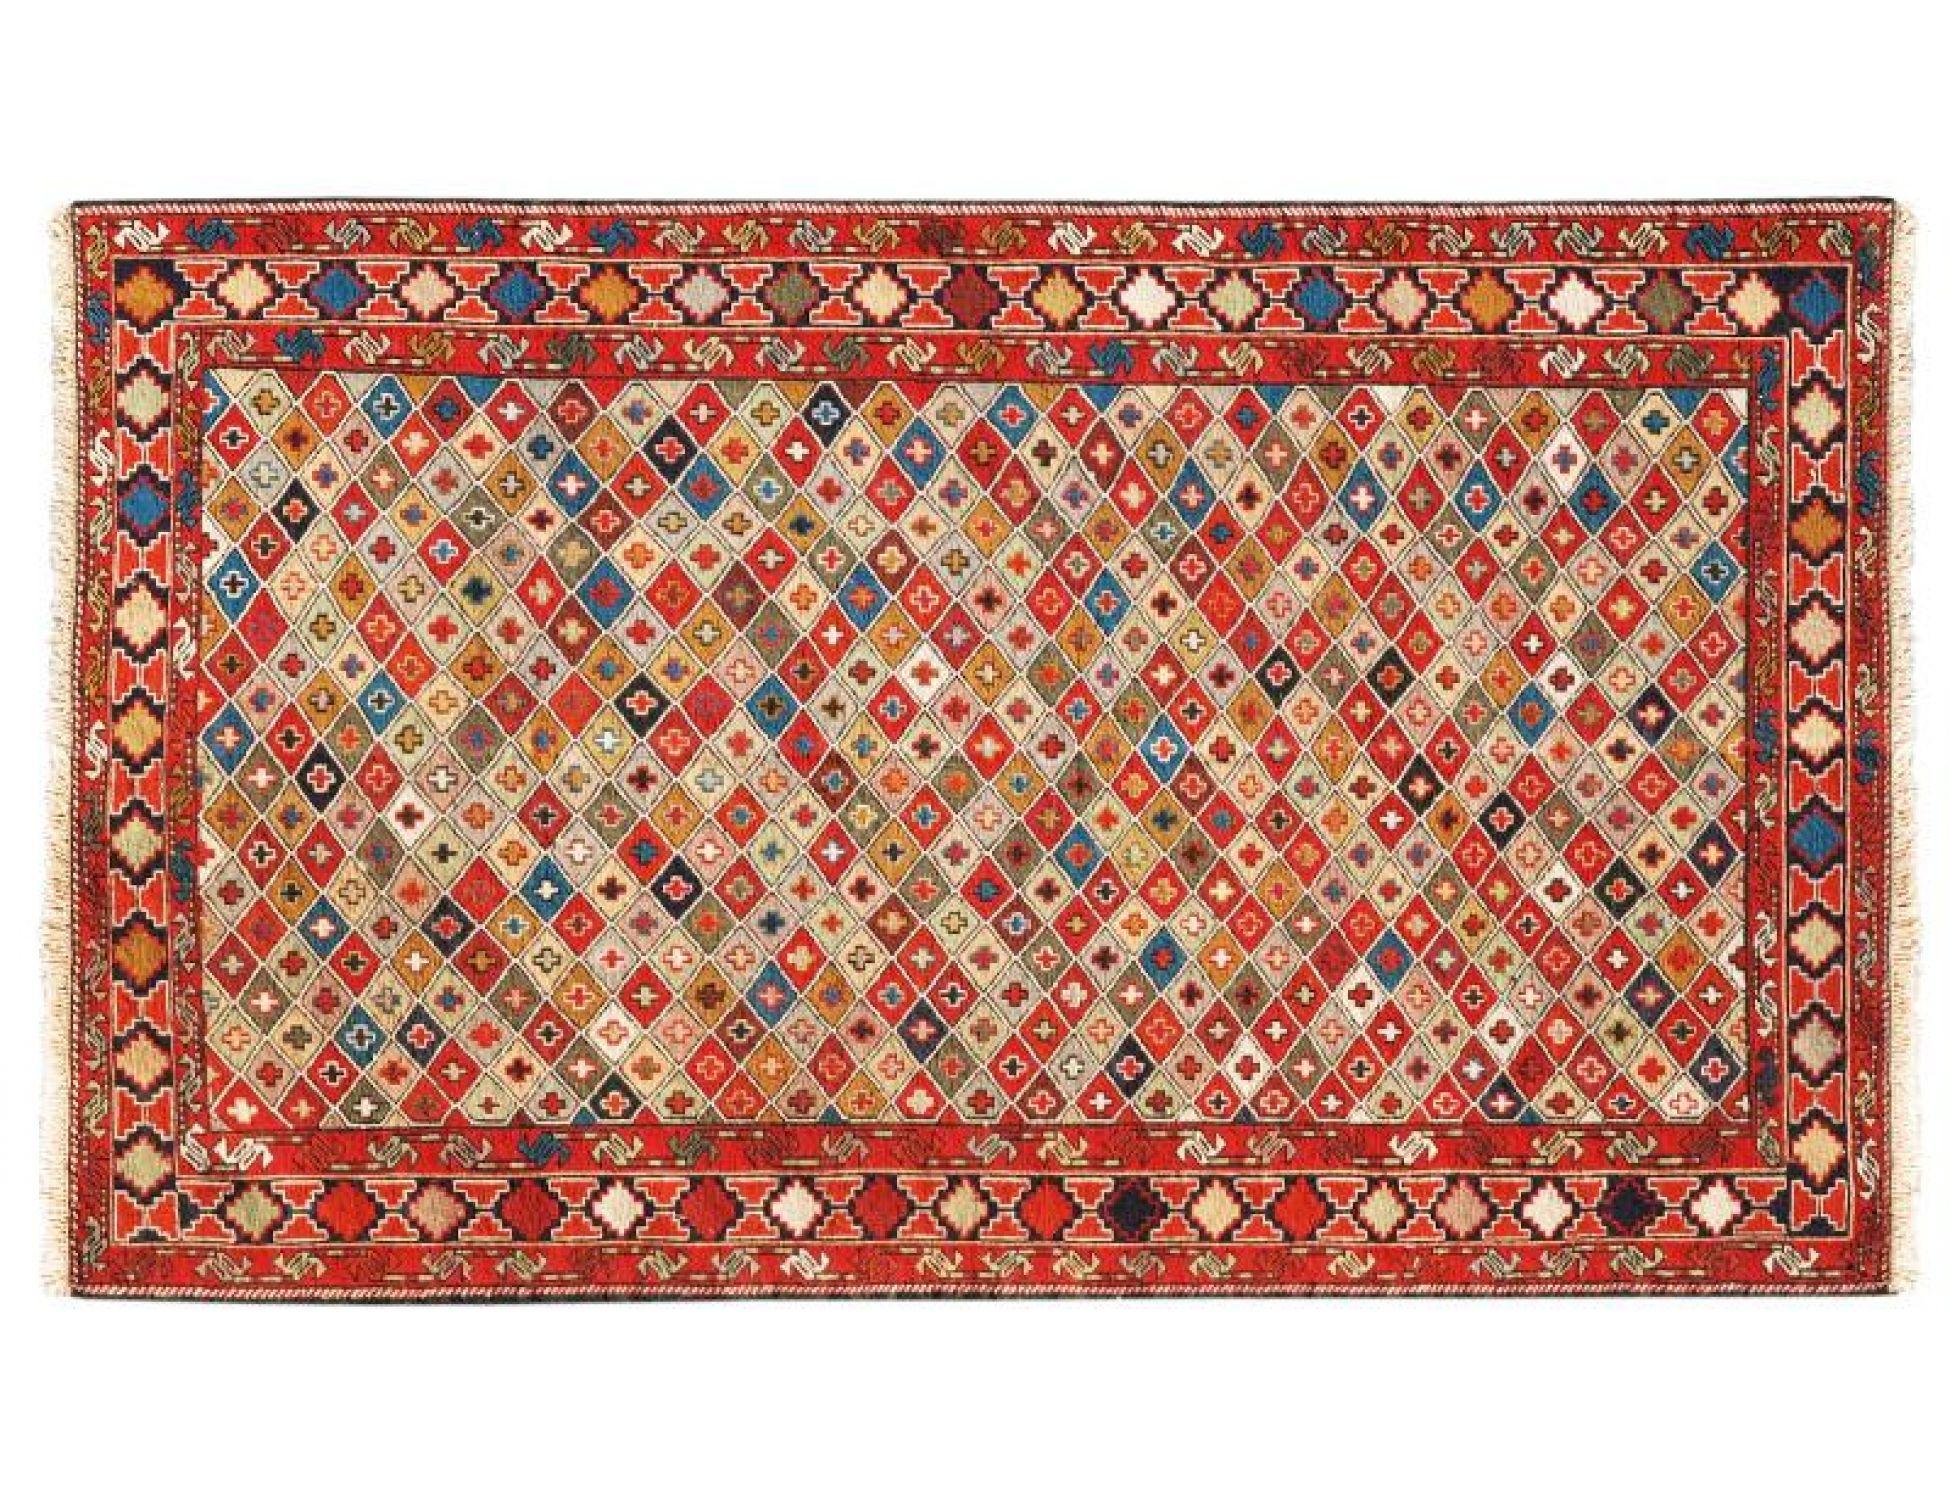 PERSIAN WOOL KILIMS   <br/>194 x 120 cm